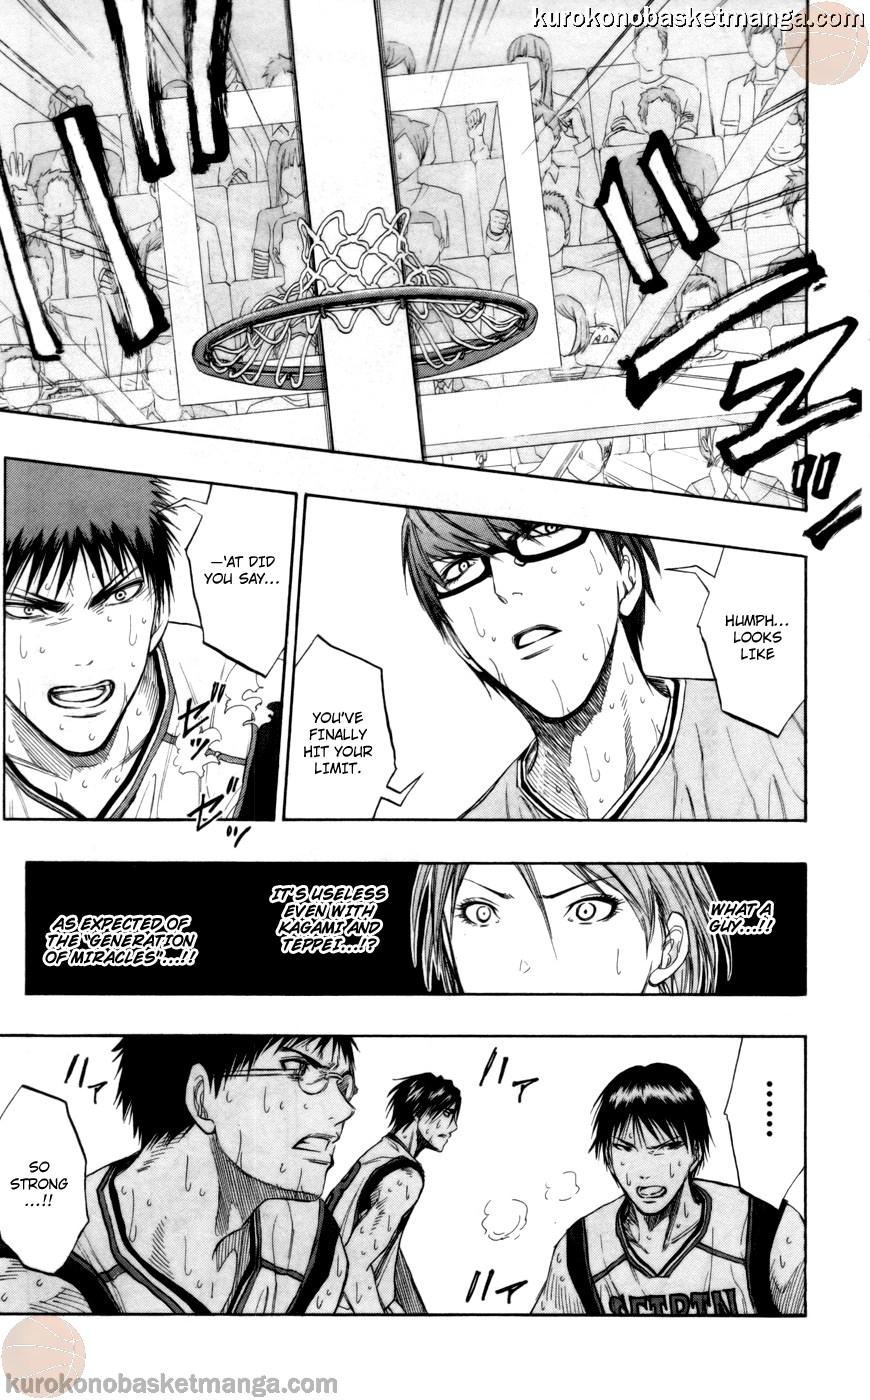 Kuroko no Basket Manga Chapter 89 - Image 13